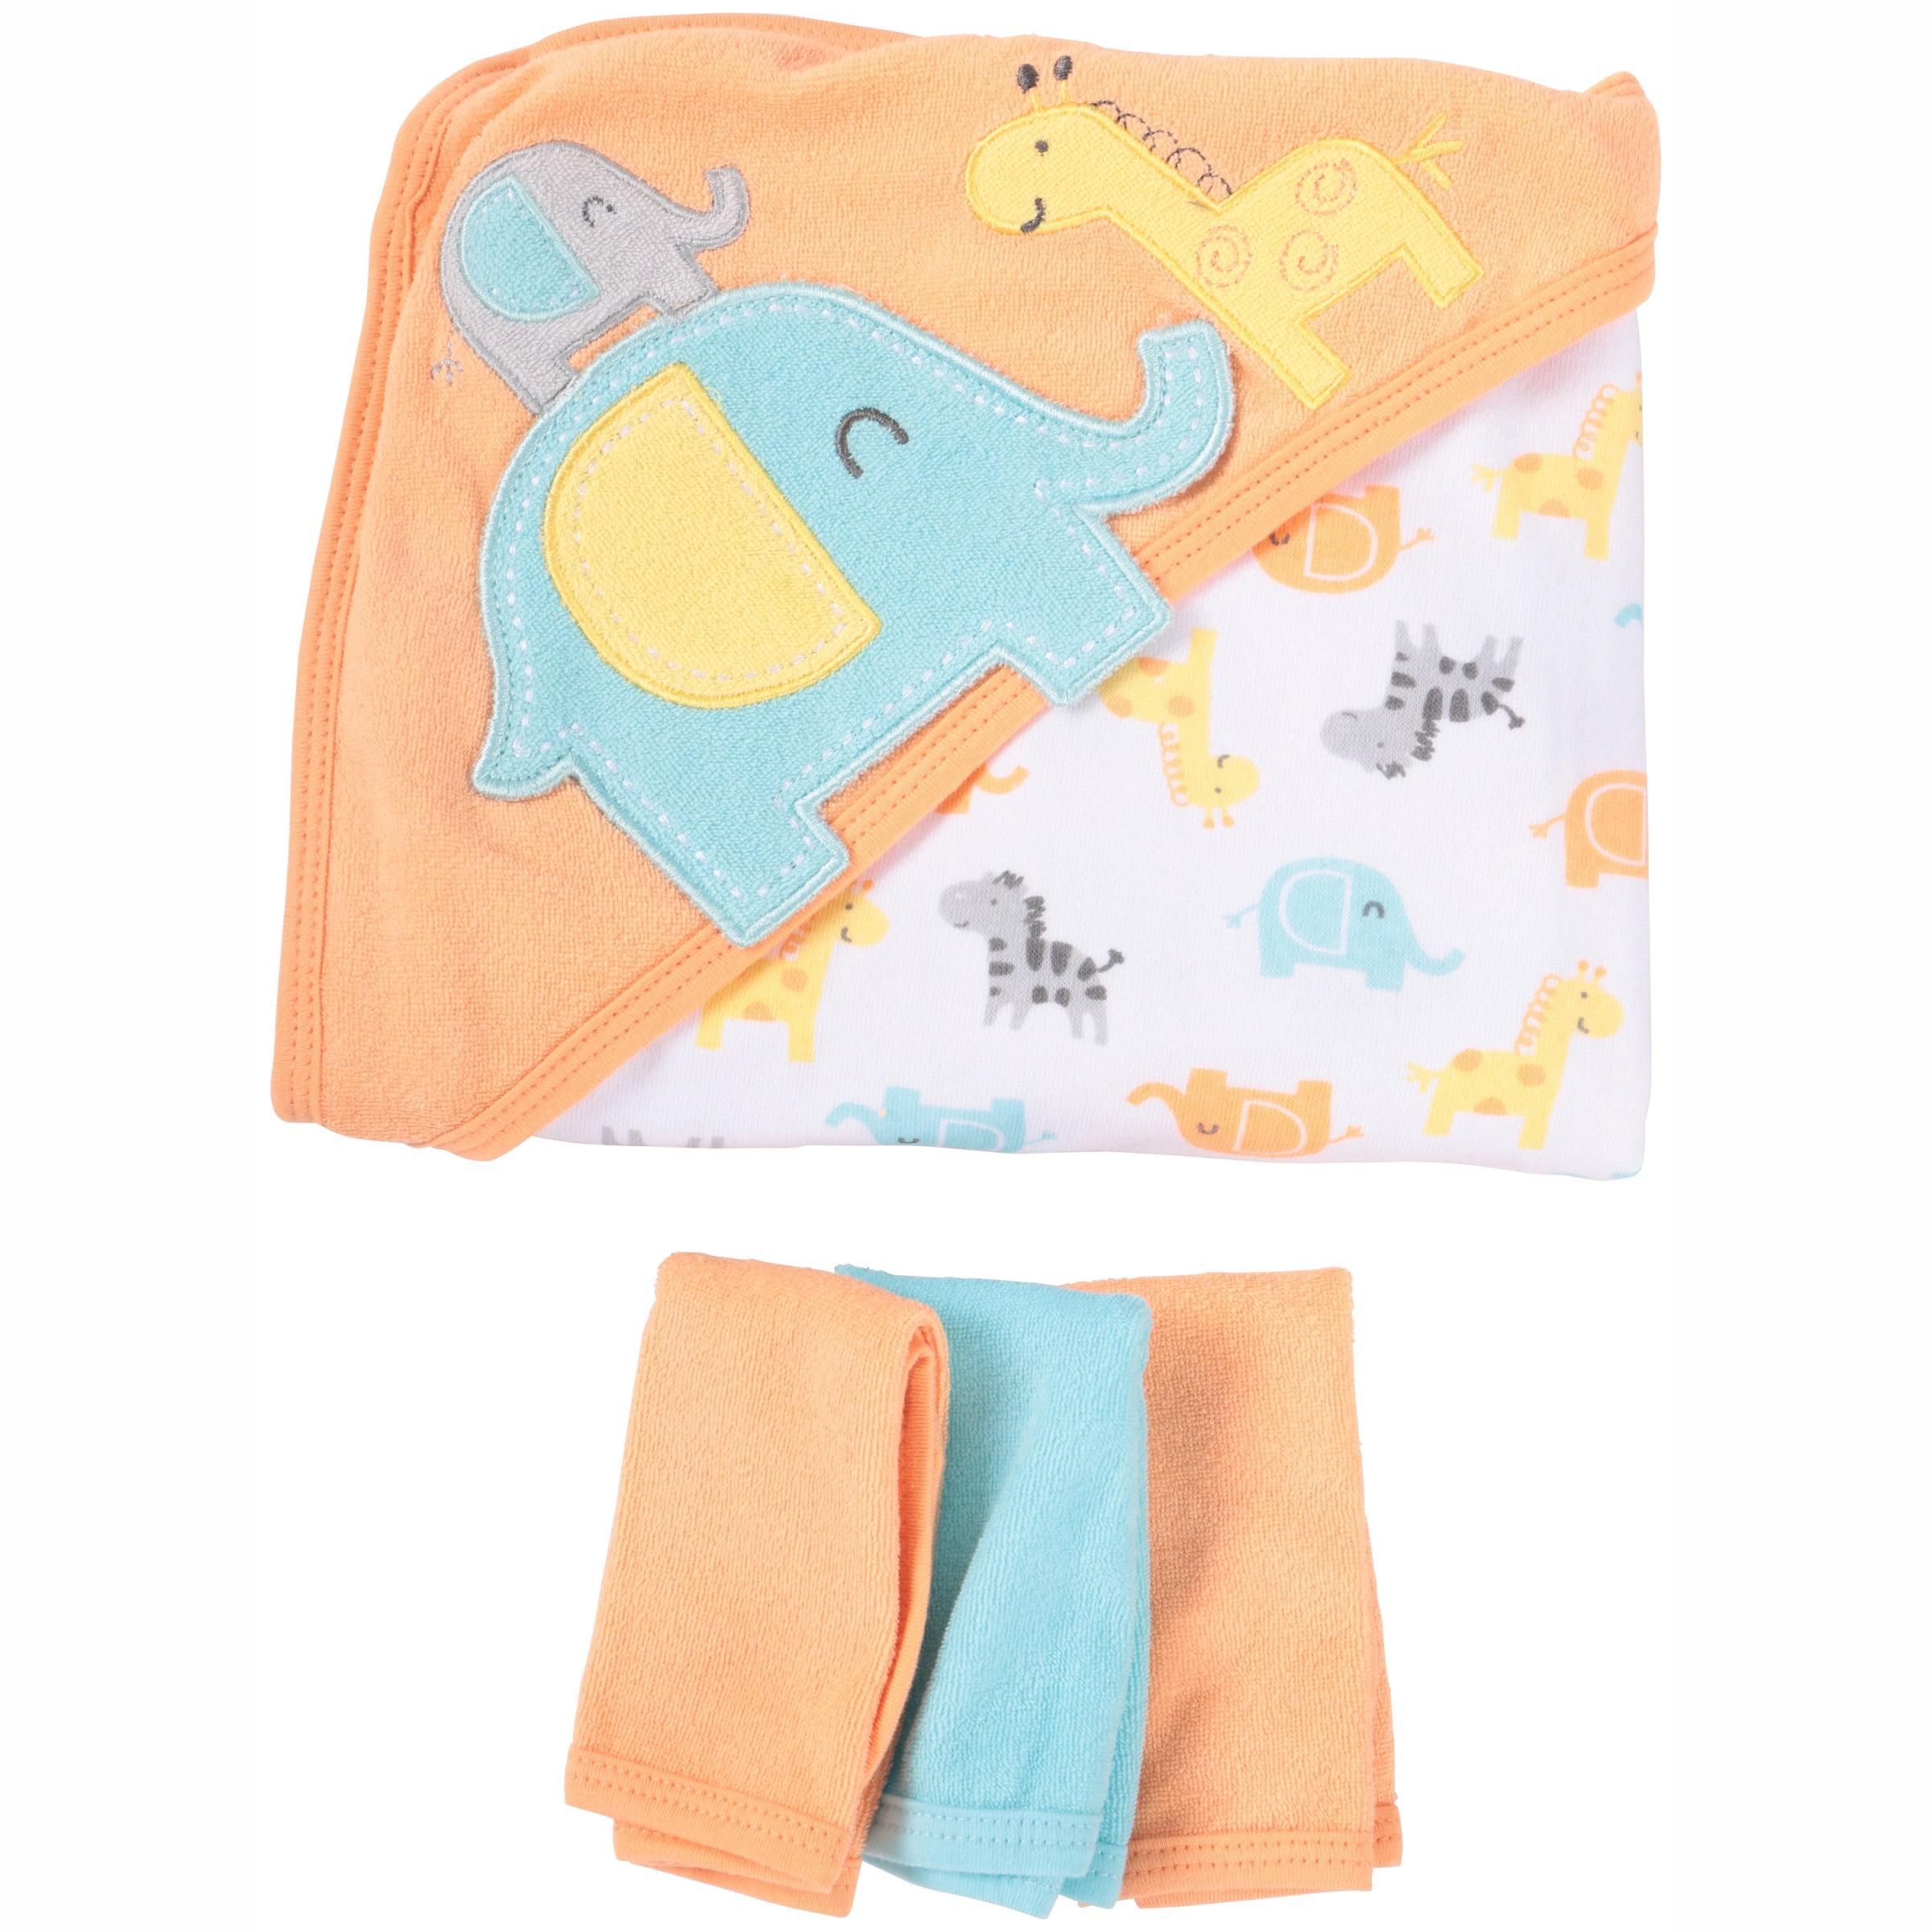 Gerber Newborn Baby Towel and Washcloths Bath Gift Set, Safari, 4 PIece